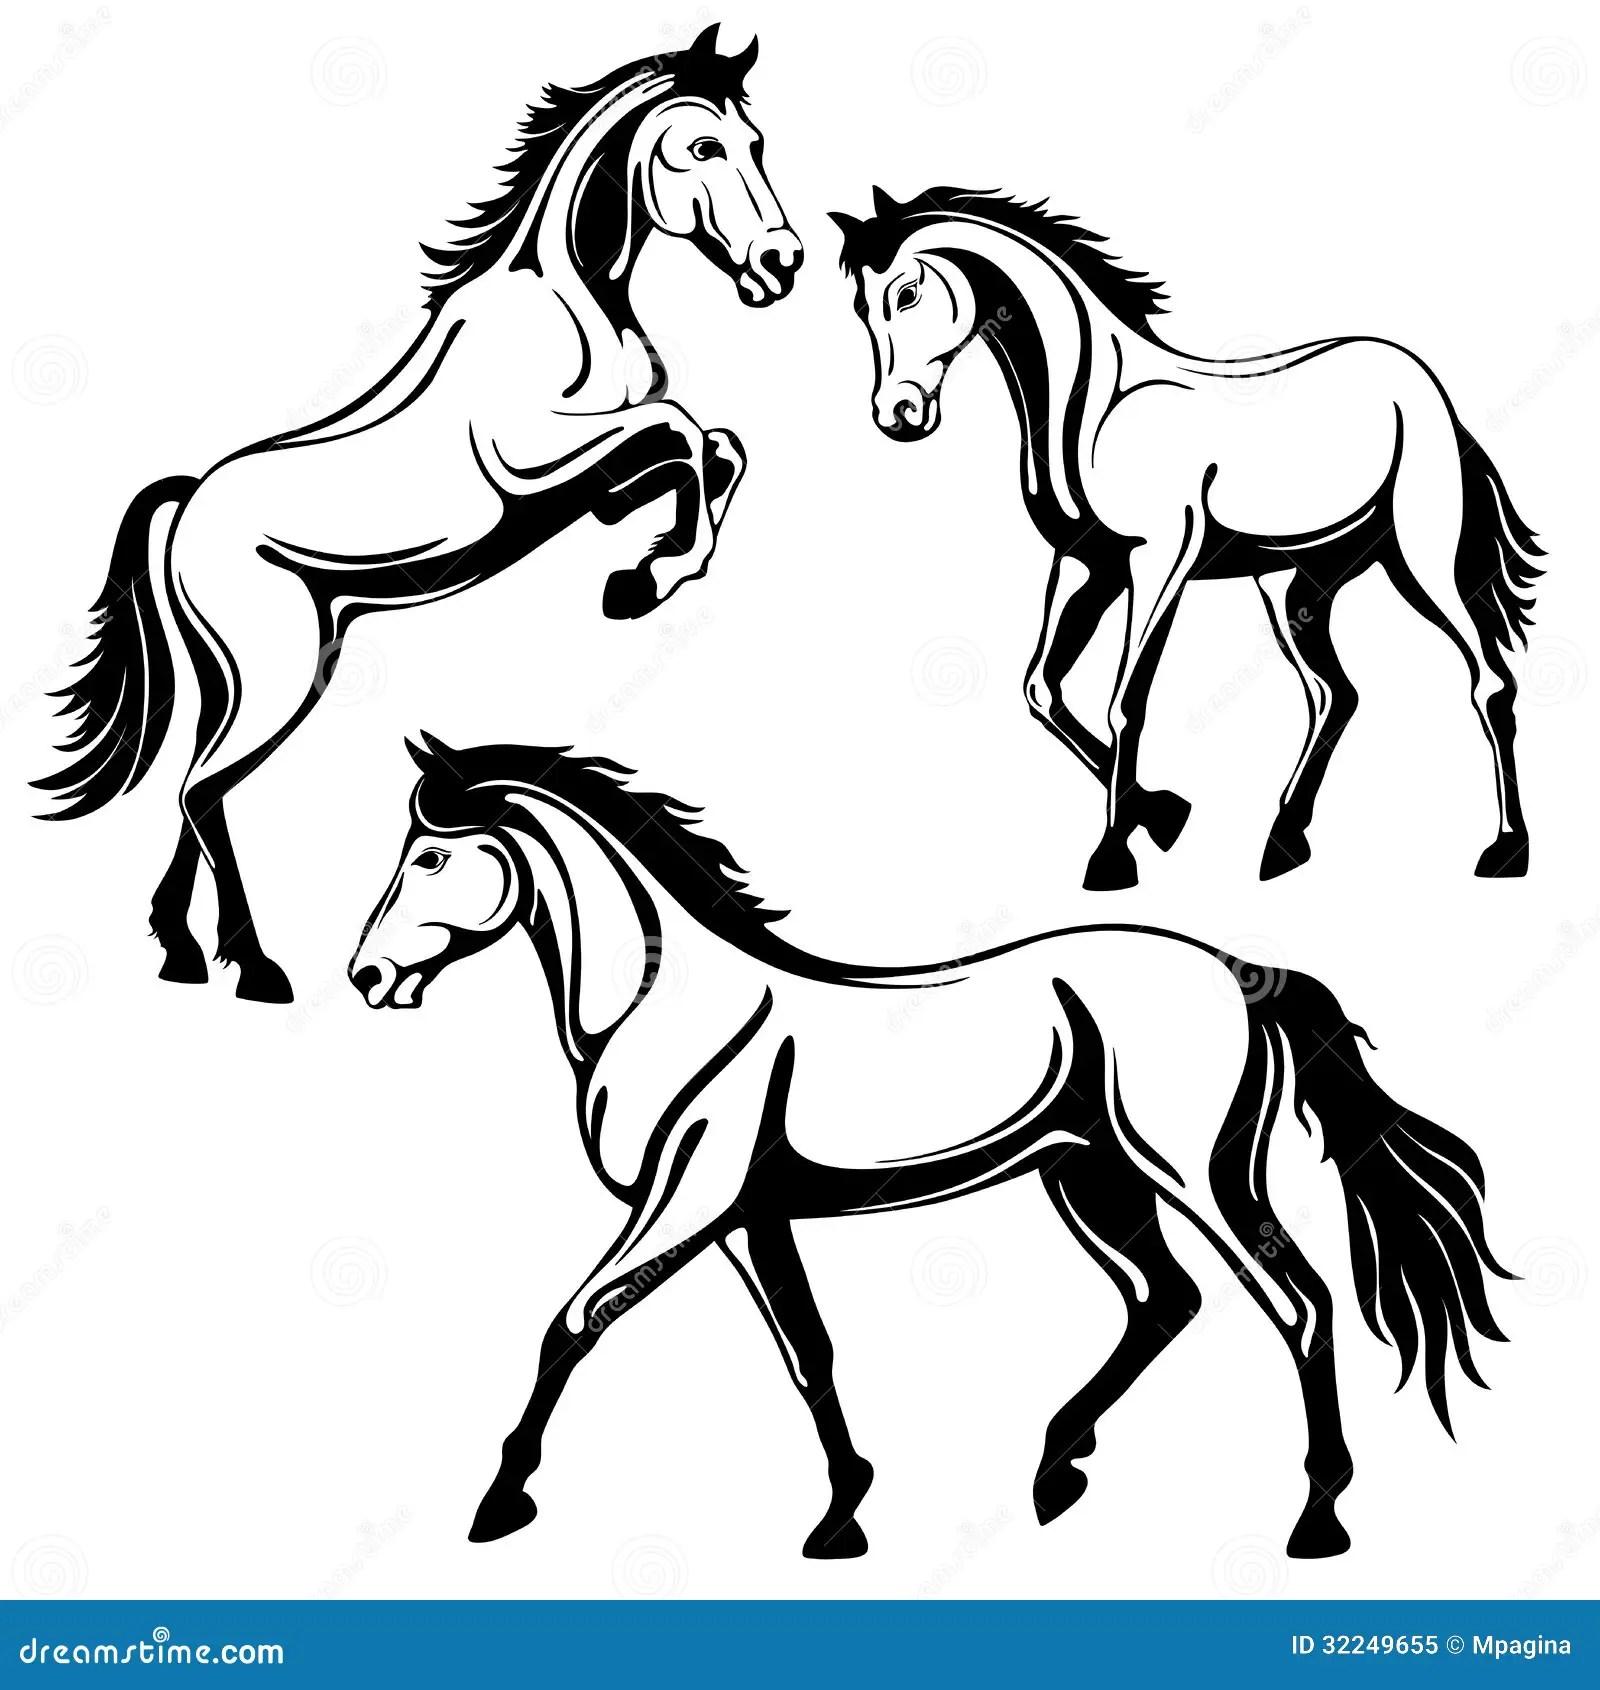 Horse Stock Vector Illustration Of Outline Mammal